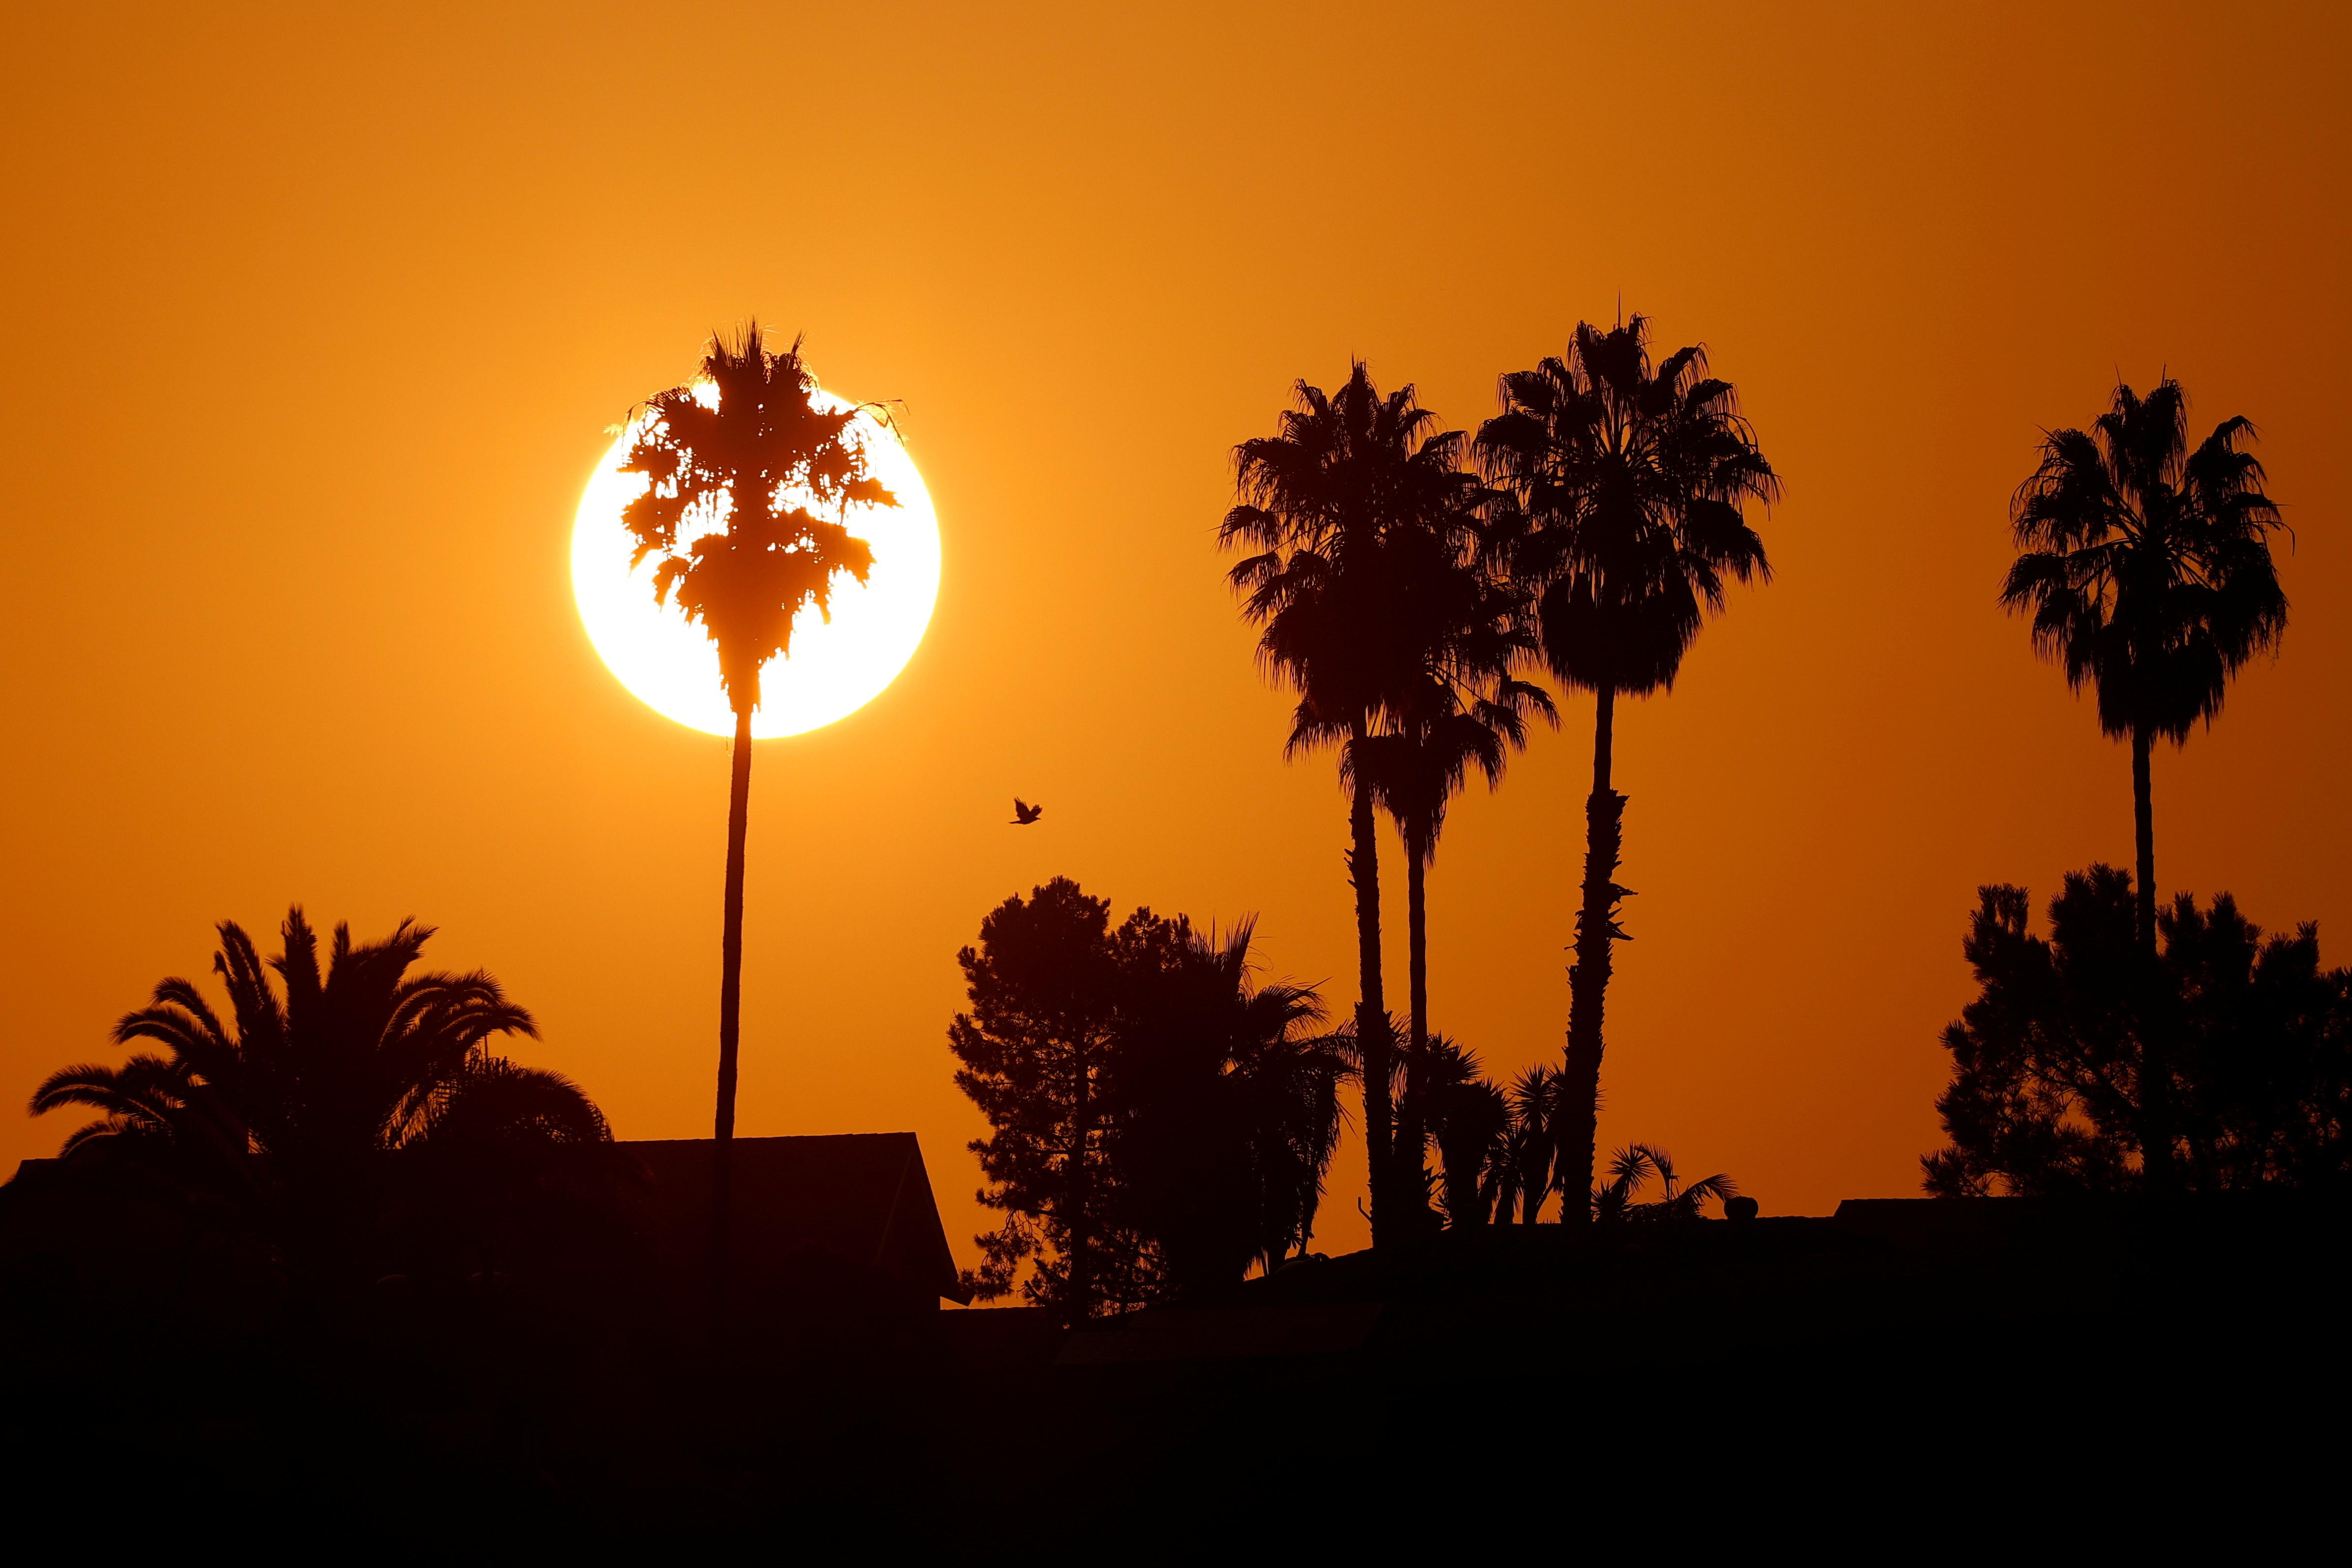 'Apocalyptic' heat wave scorches U.S. Southwest again